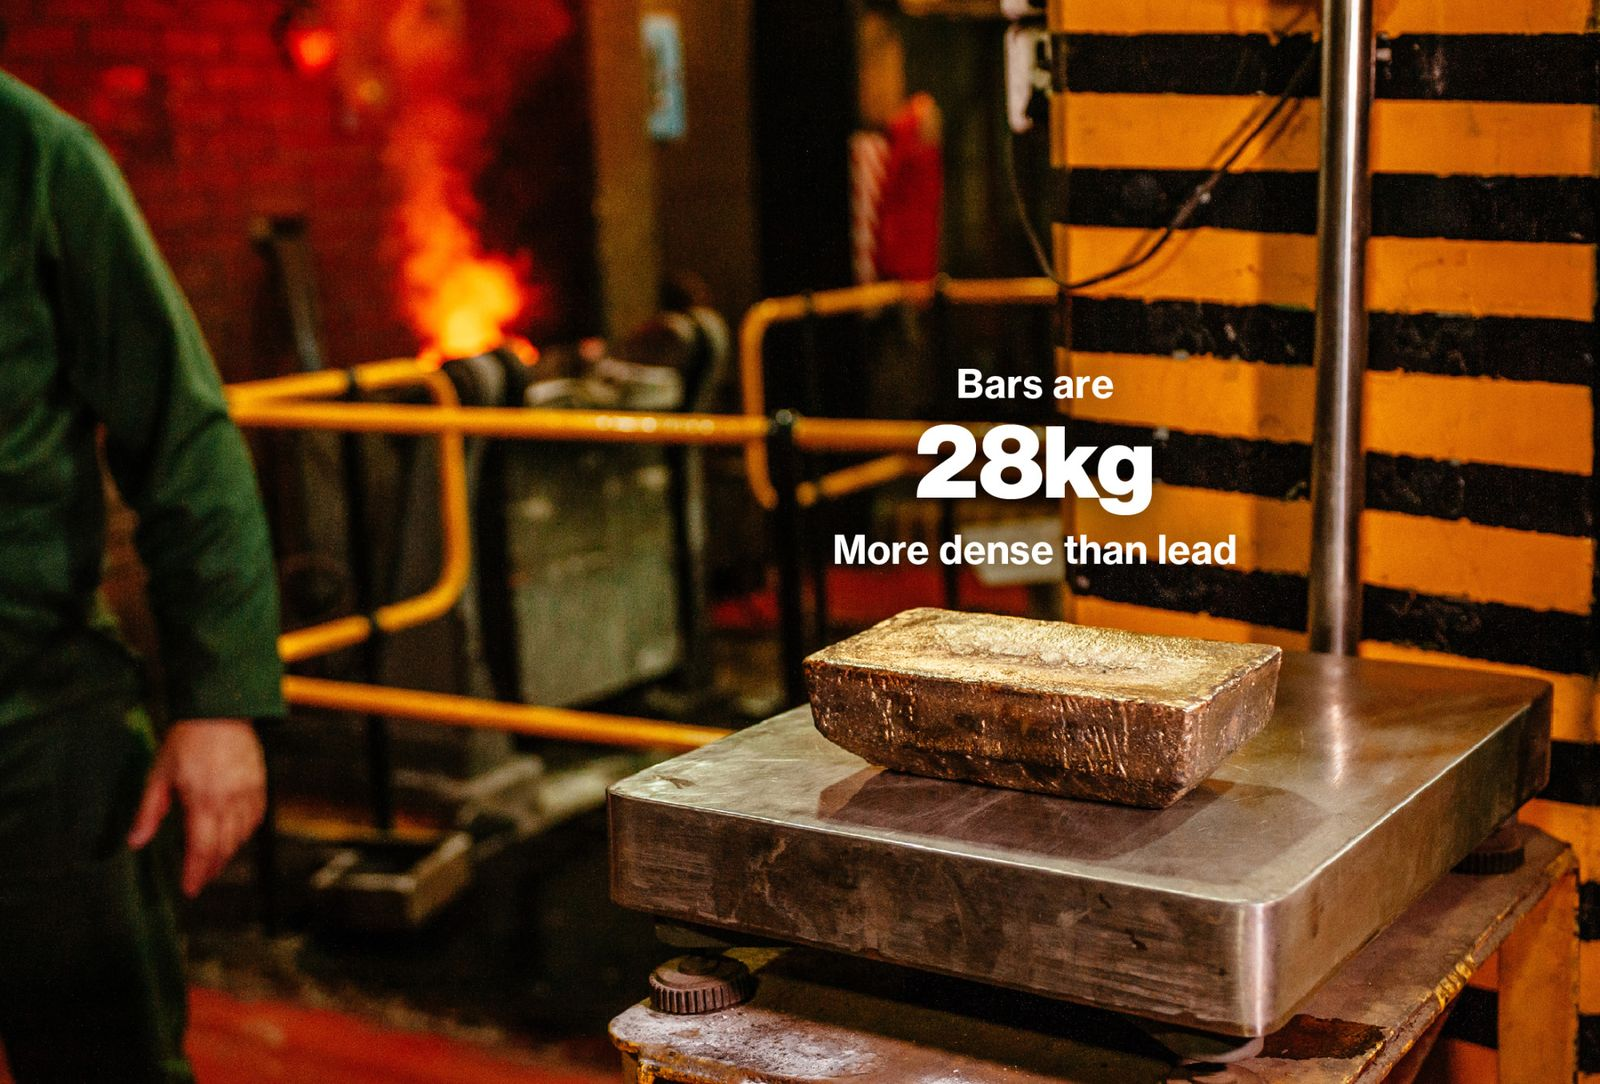 Gold Fields公司预计,从2022年开始维持South Deep运营的每盎司开采成本为900美元,远低于目前近1300美元的水平。